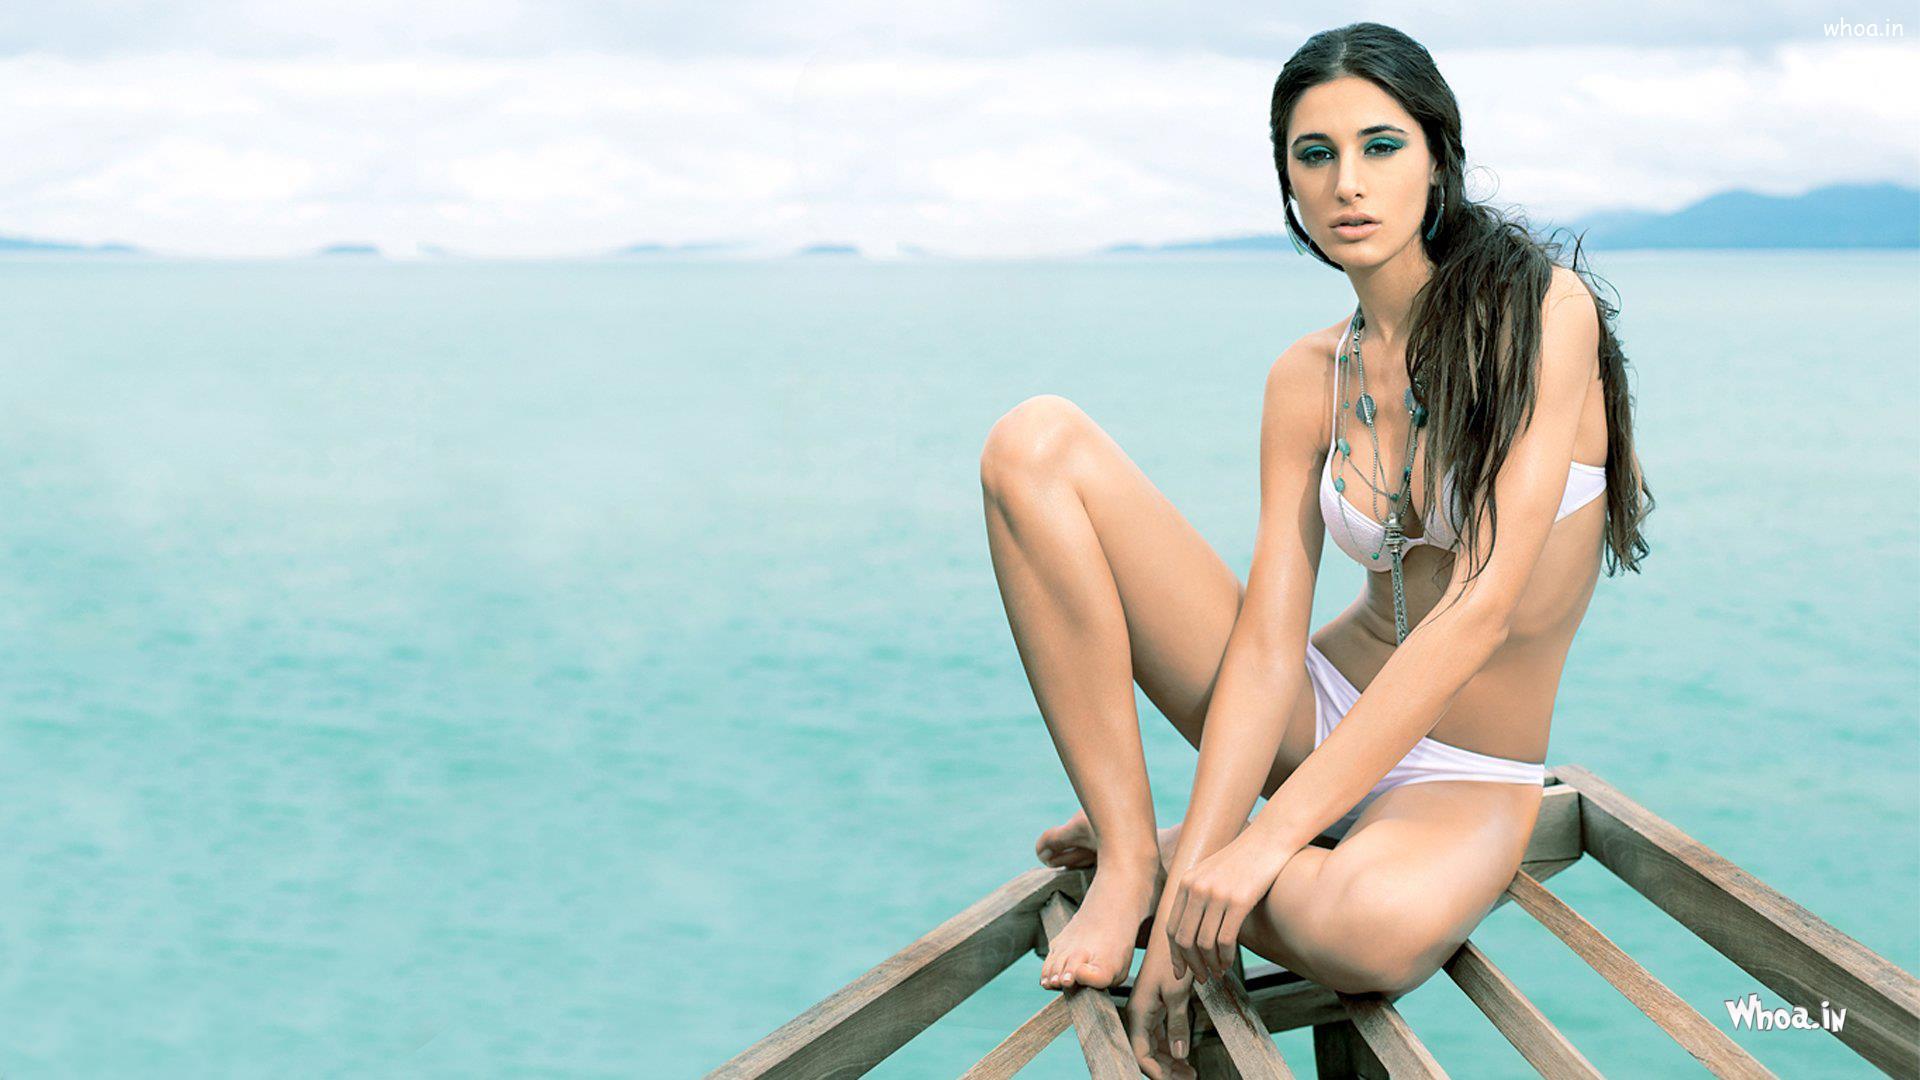 nargis fakhri hot bikini photoshoot